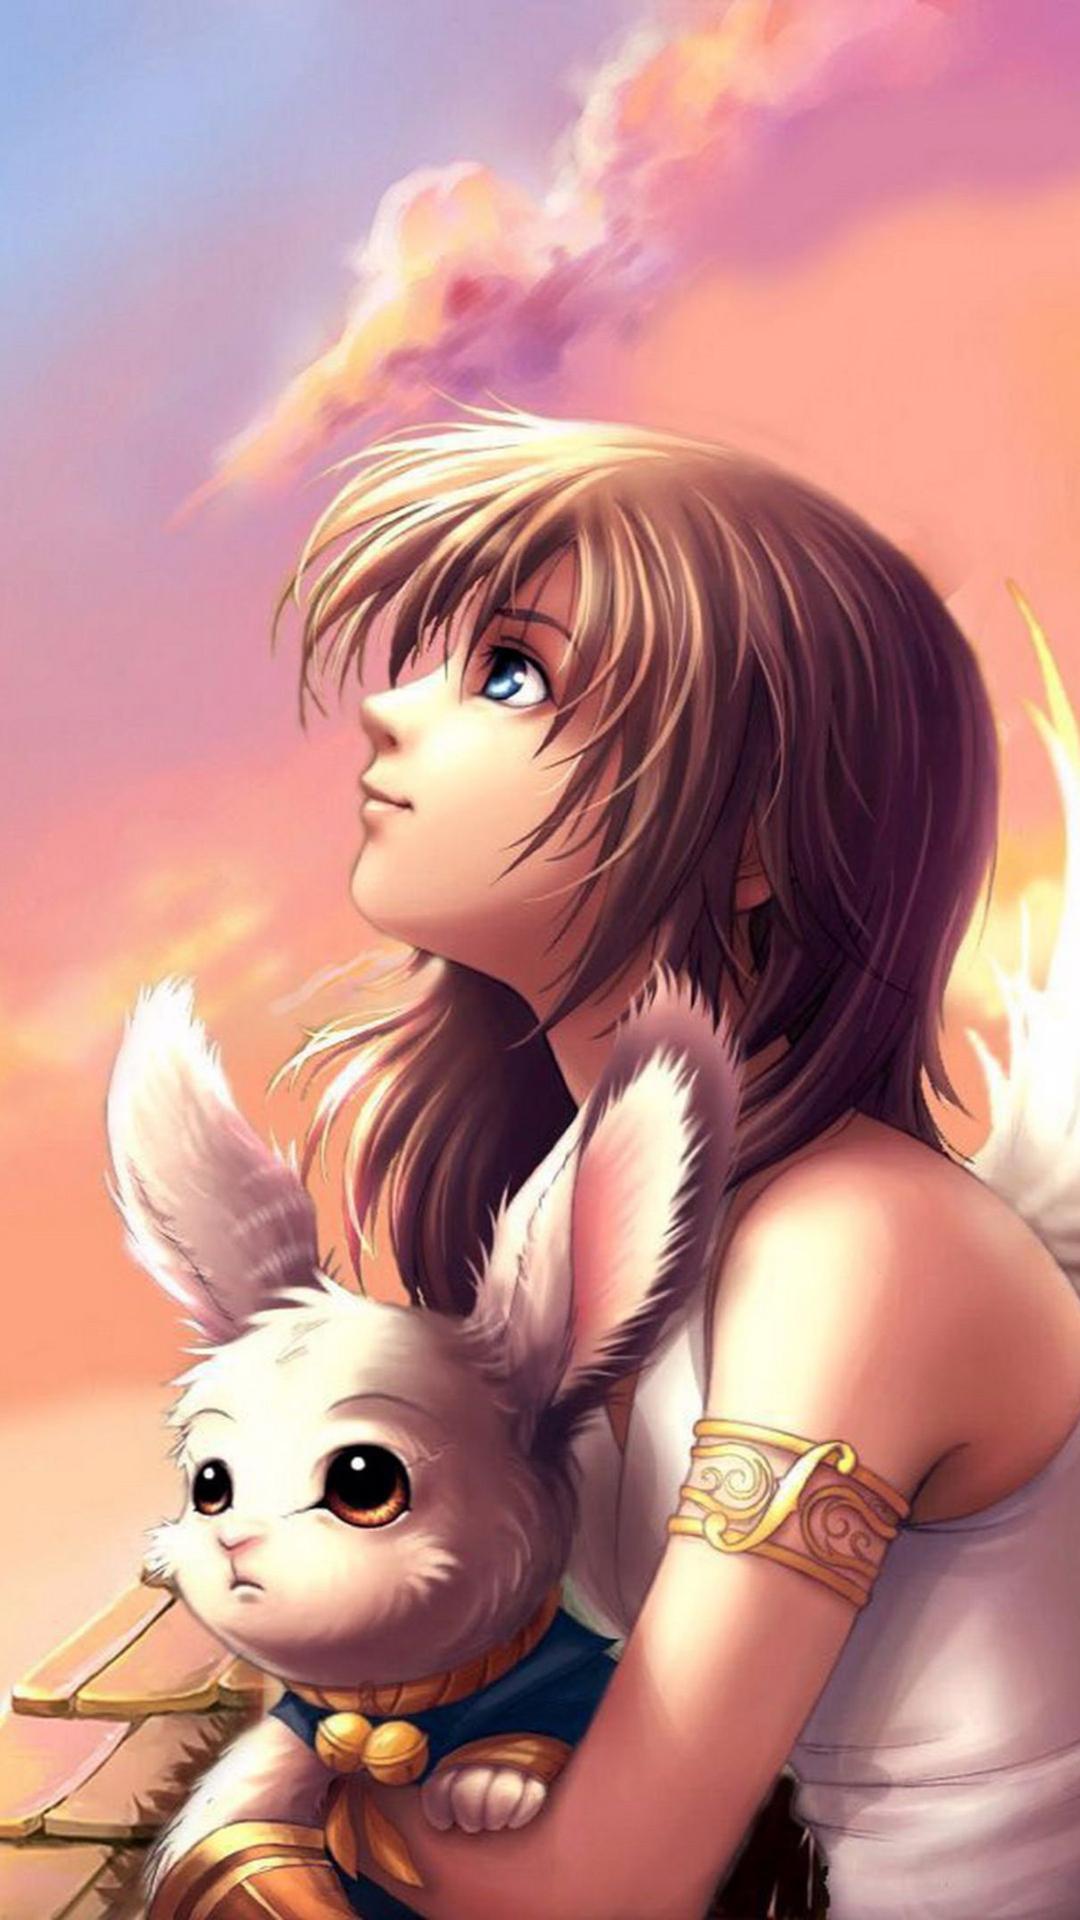 16 Anime Girl Wallpaper Iphone 6